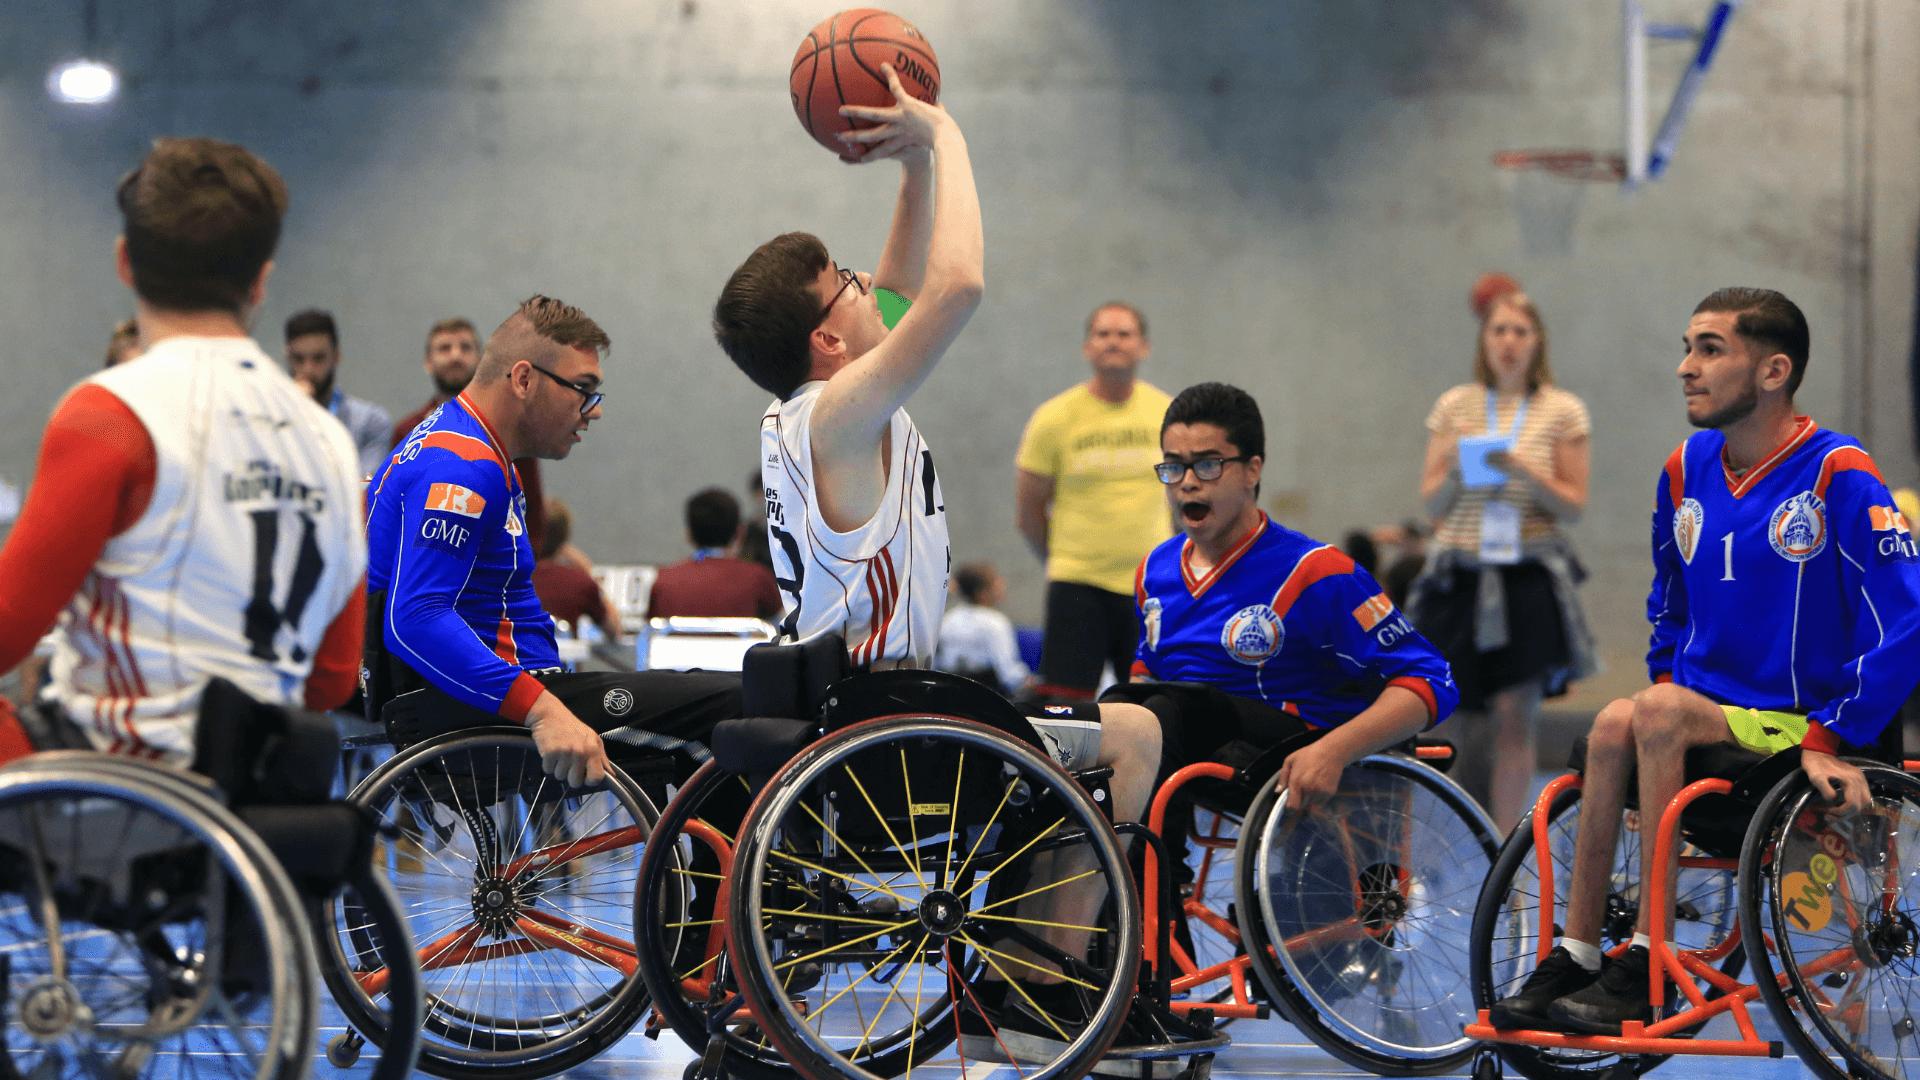 Handisport Valence joue au basket